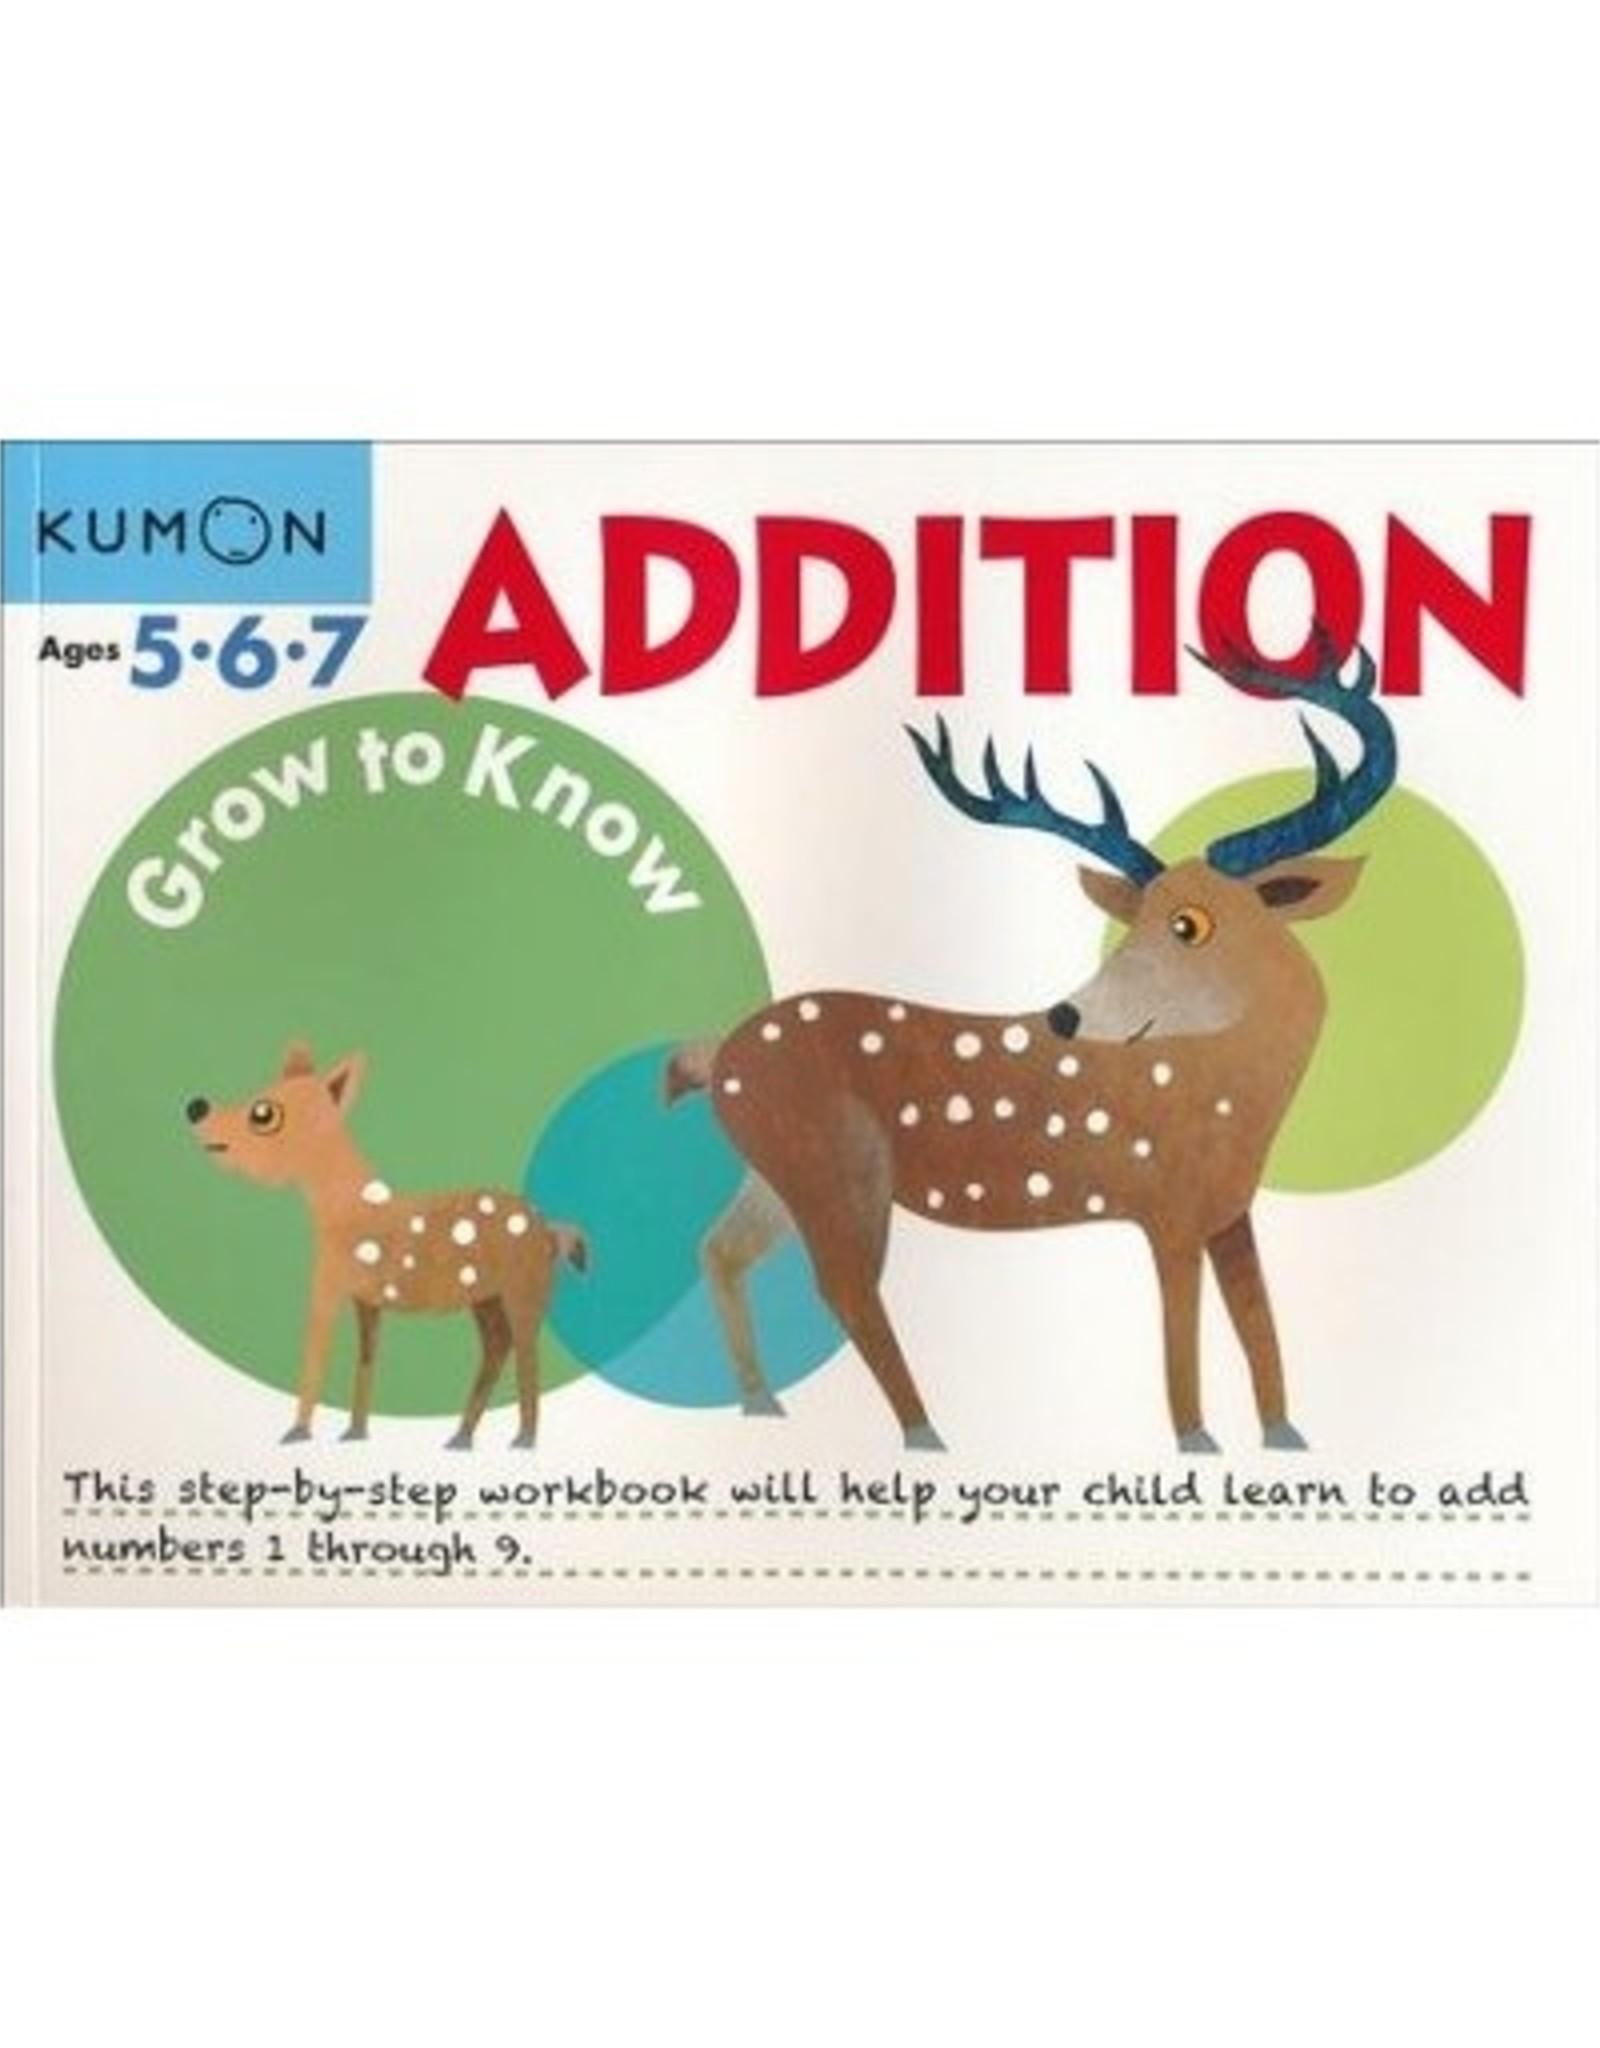 Kumon GROW-TO-KNOW ADDITION